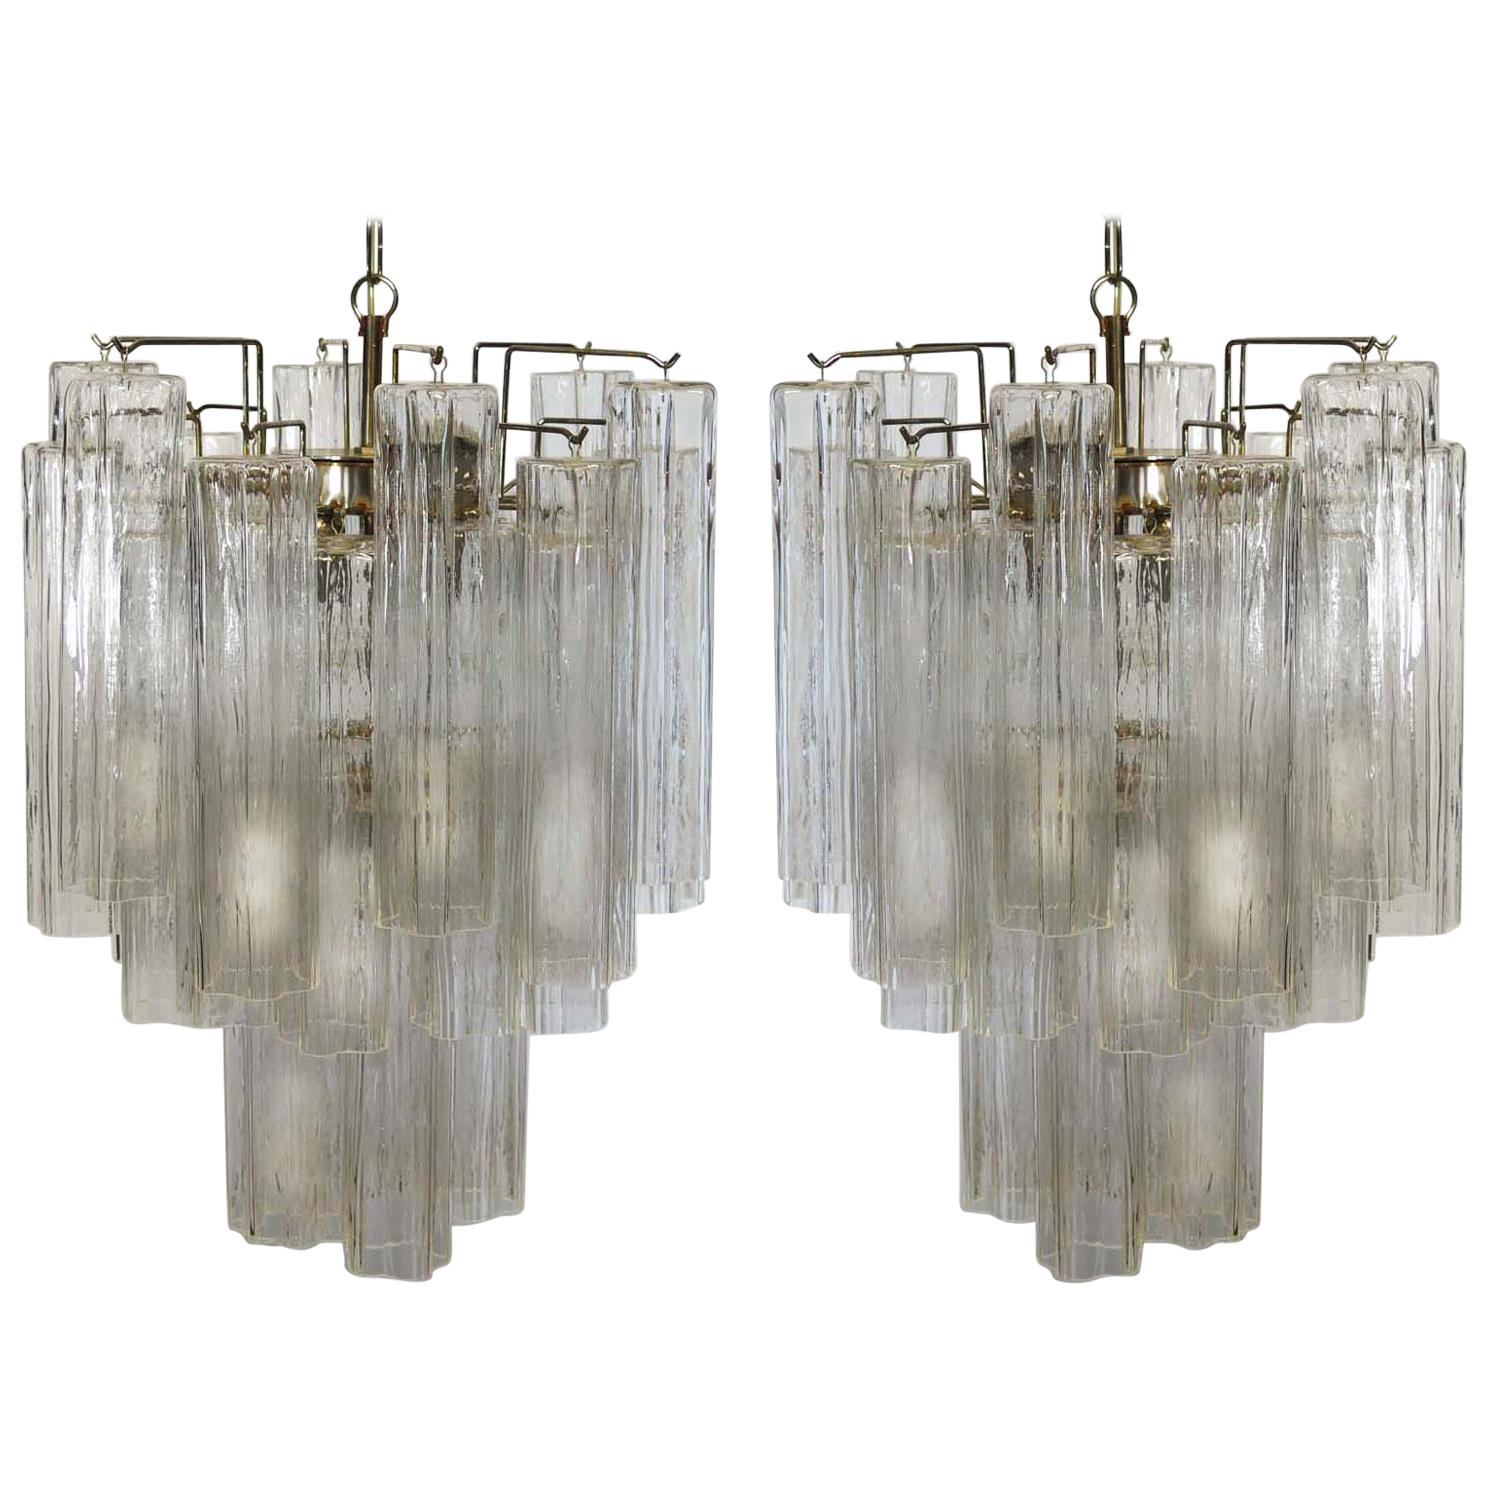 Pair of Tronchi Chandelier in Toni Zuccheri Style for Venini, Murano